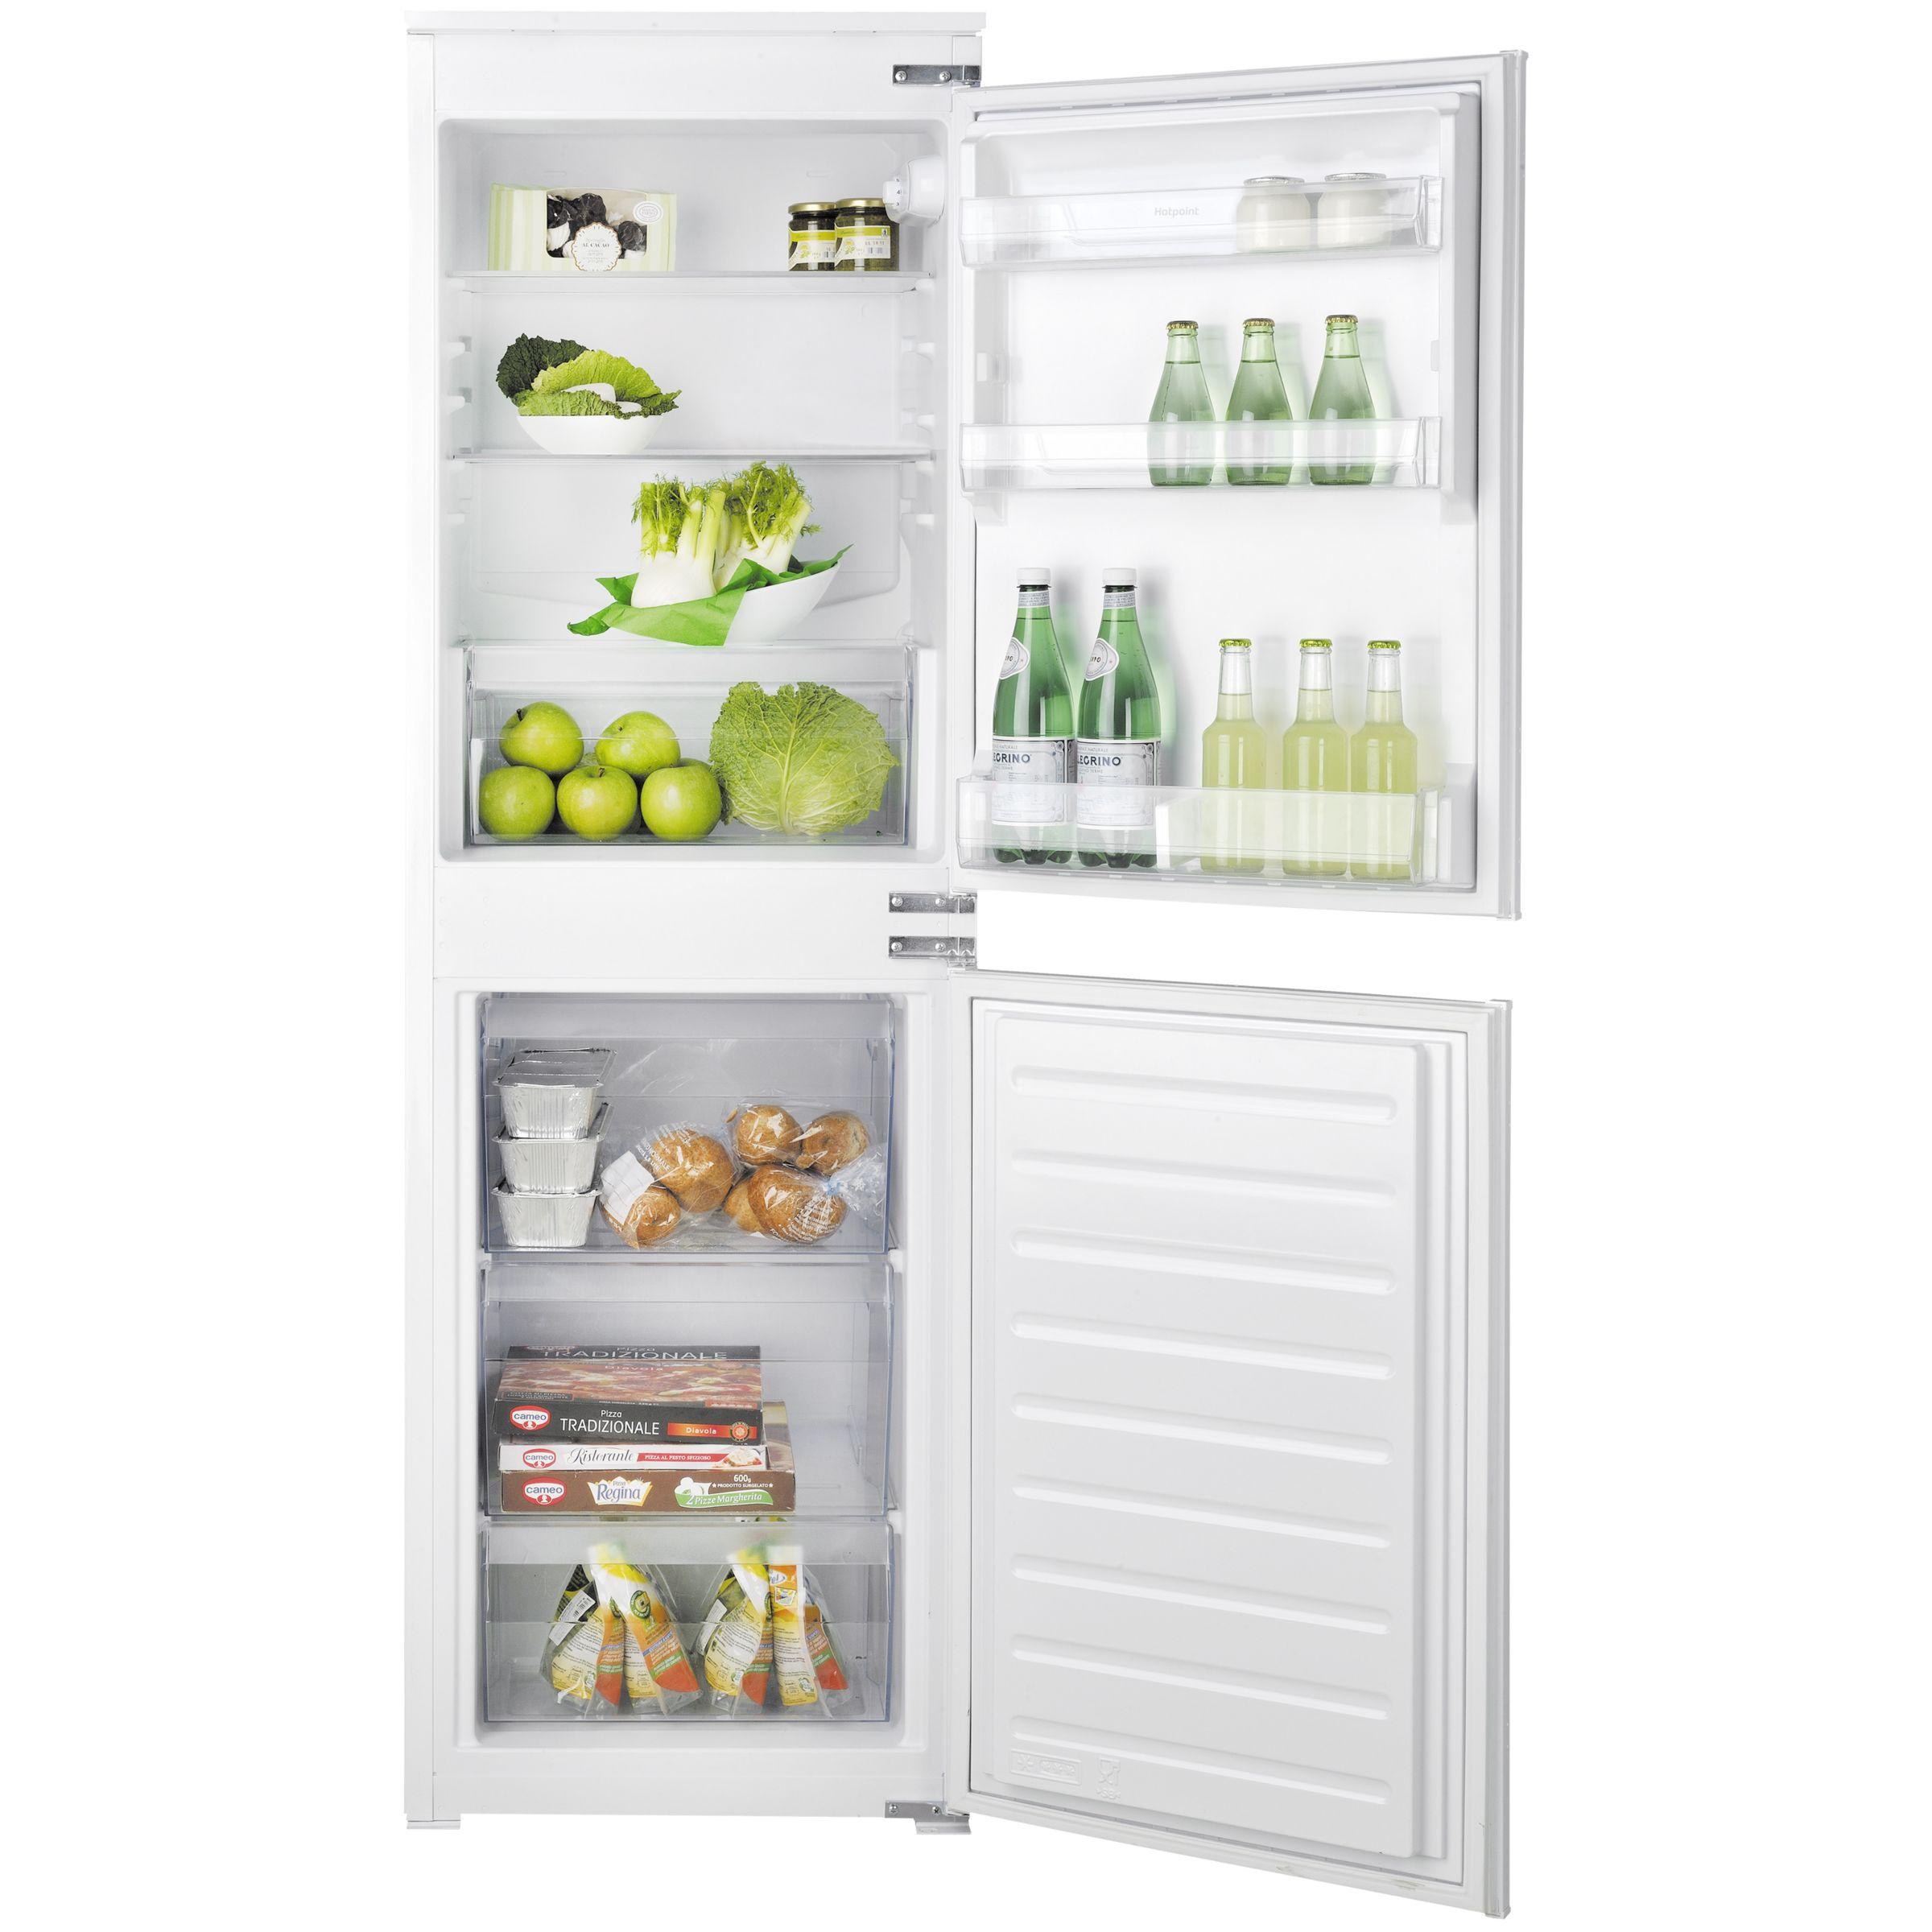 Hotpoint Hotpoint HMCB5050AA.UK Integrated Fridge Freezer, A+ Energy Rating, 54cm Wide, White